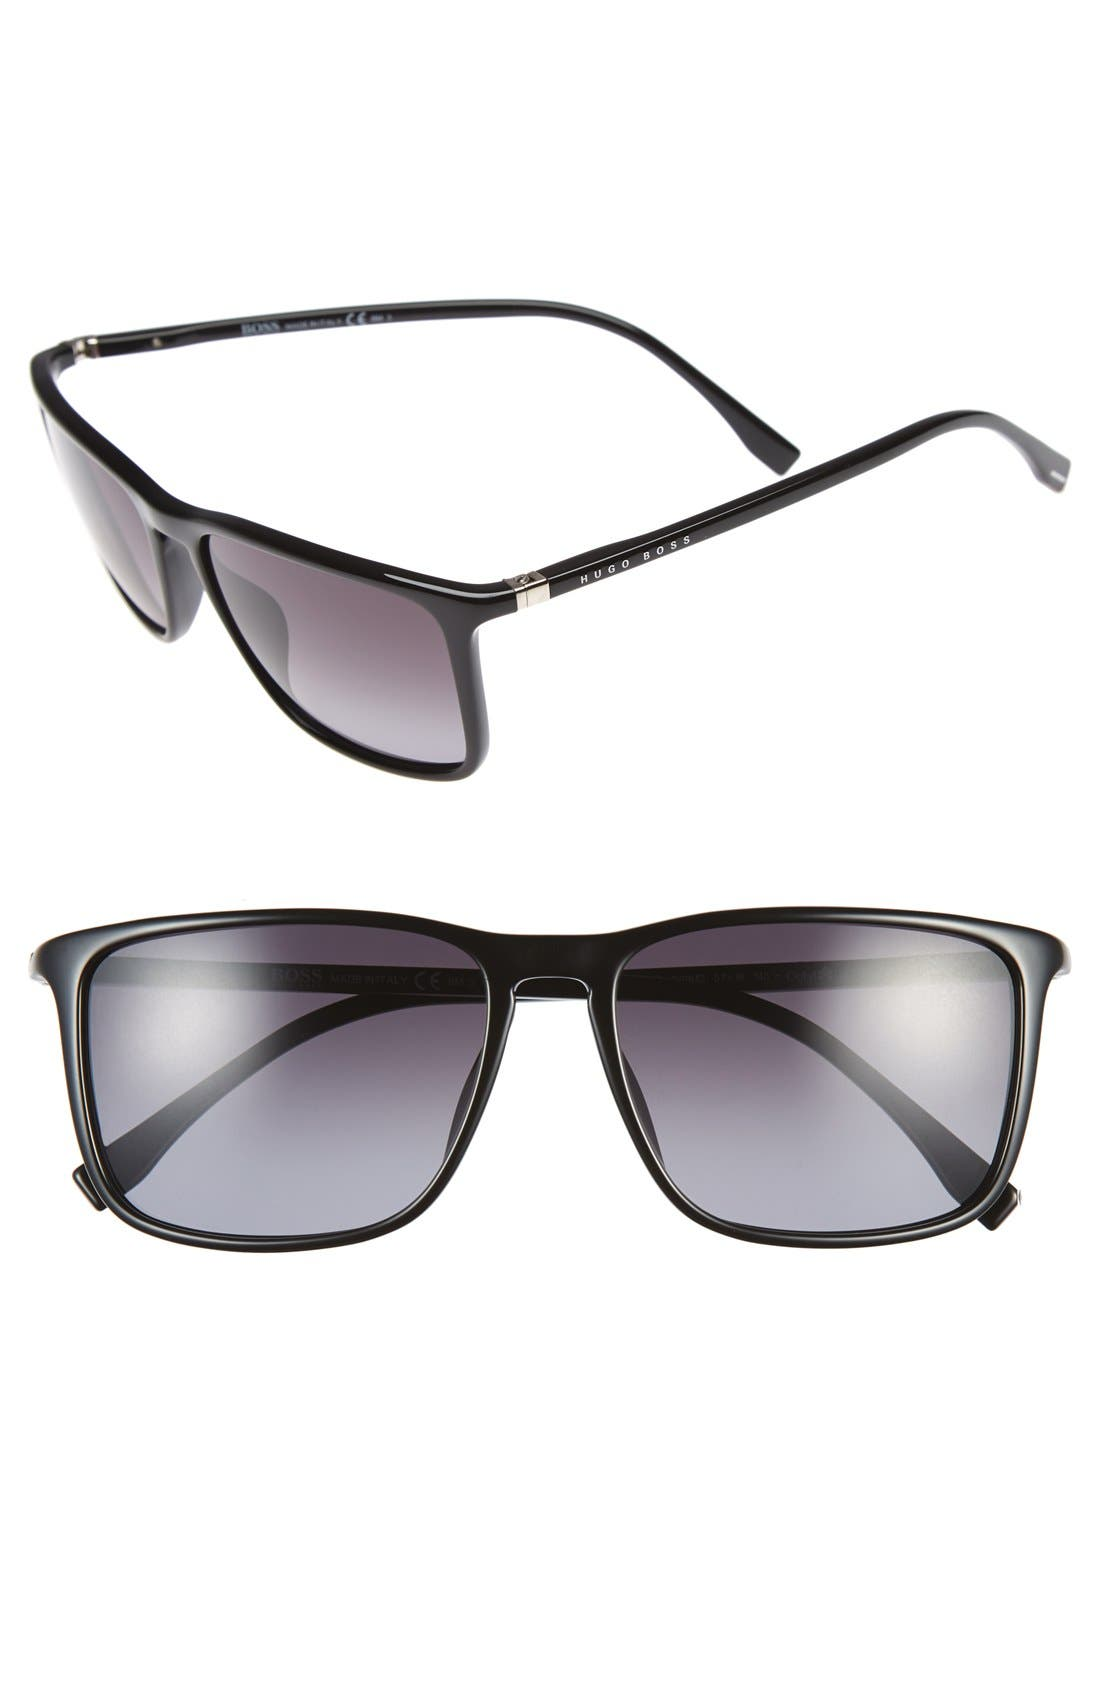 BOSS 57mm Retro Sunglasses